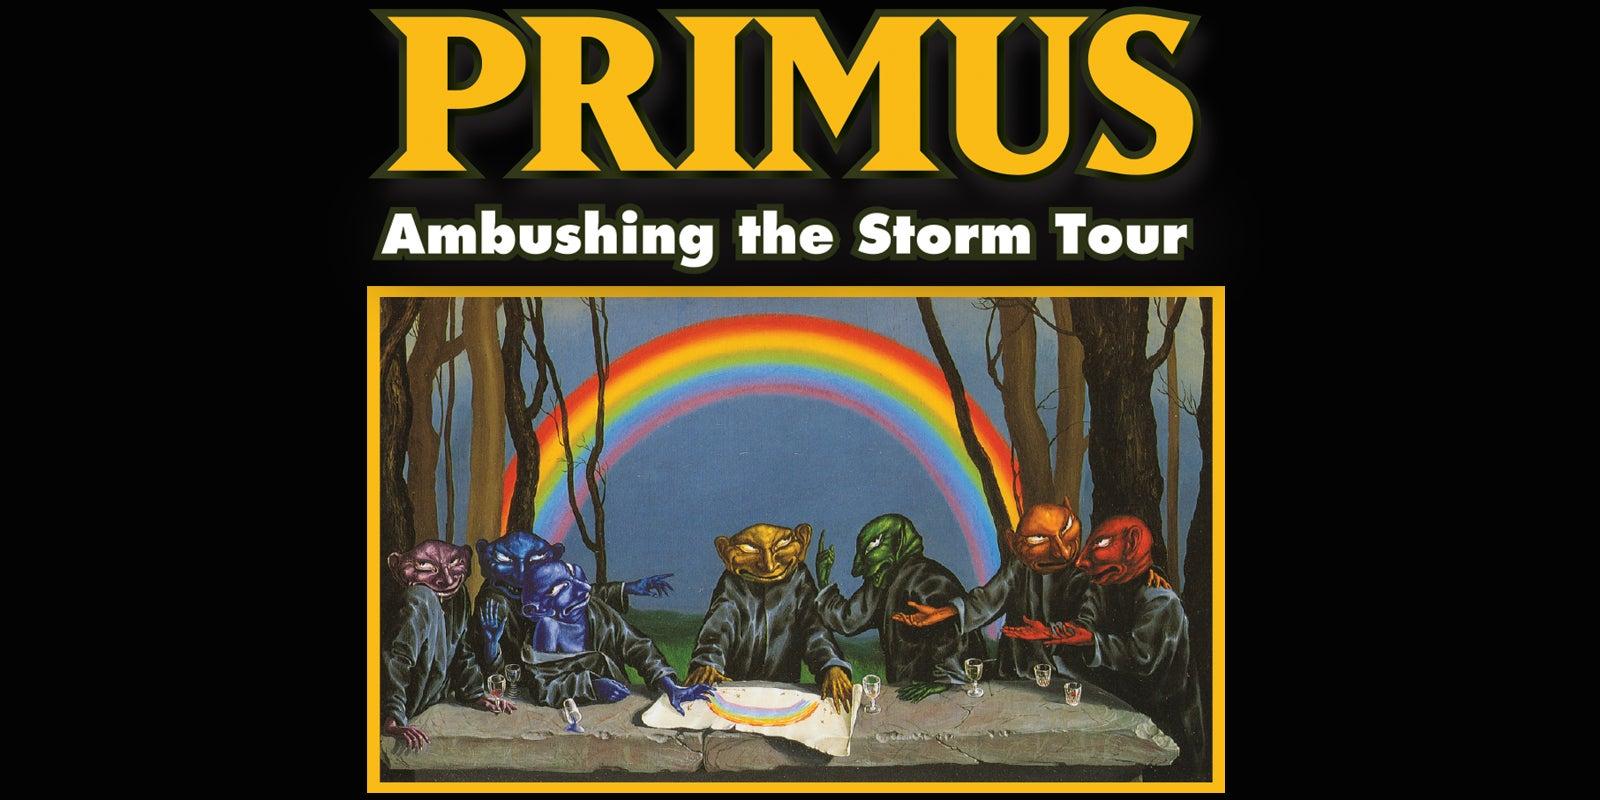 Primus - Wide.jpg